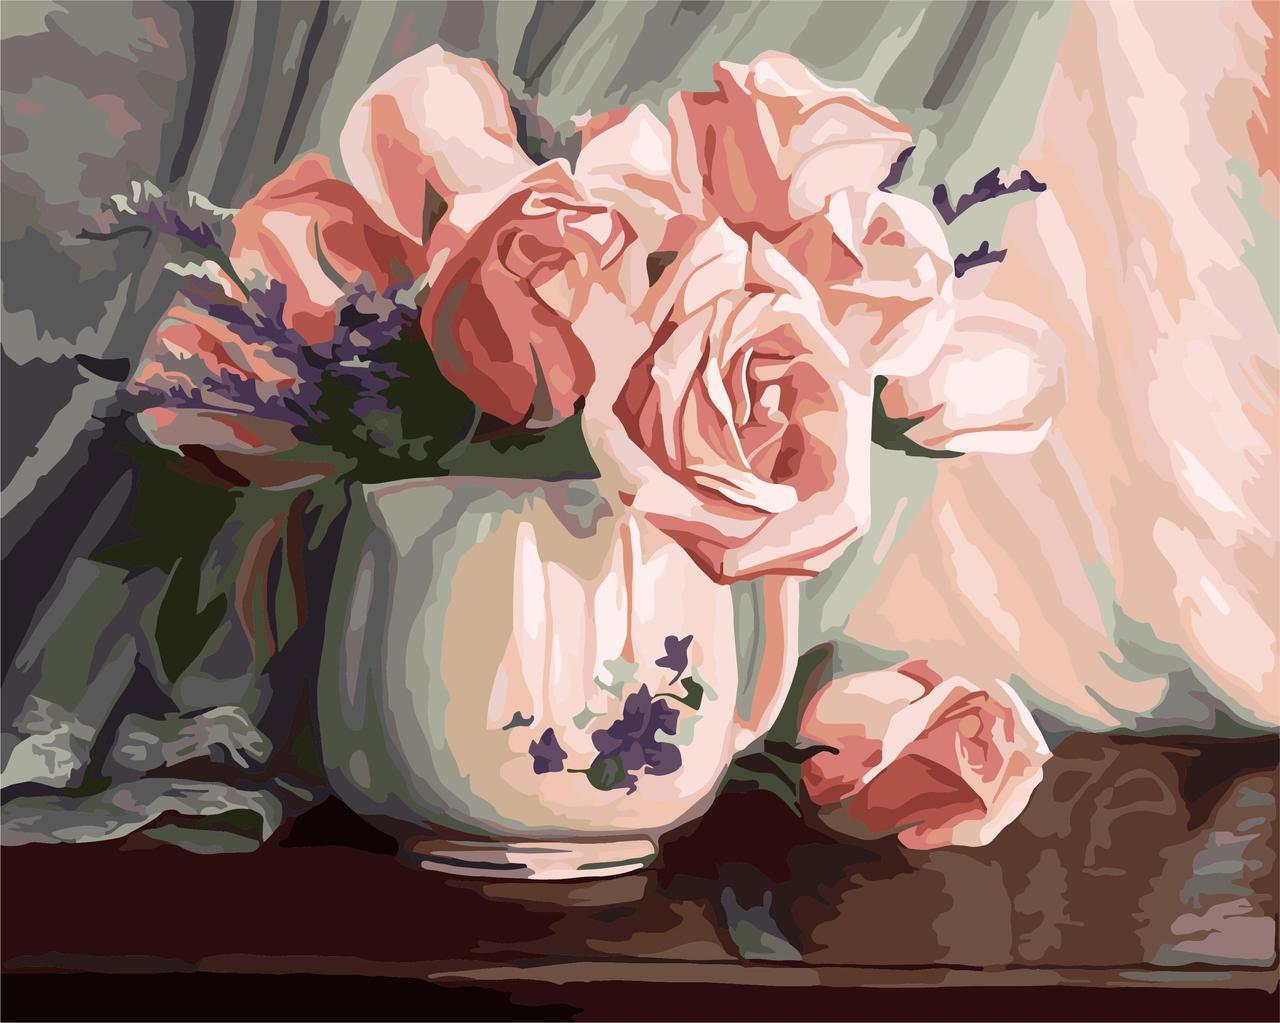 Картина по номерам Розовая романтика, 40x50 см., Идейка